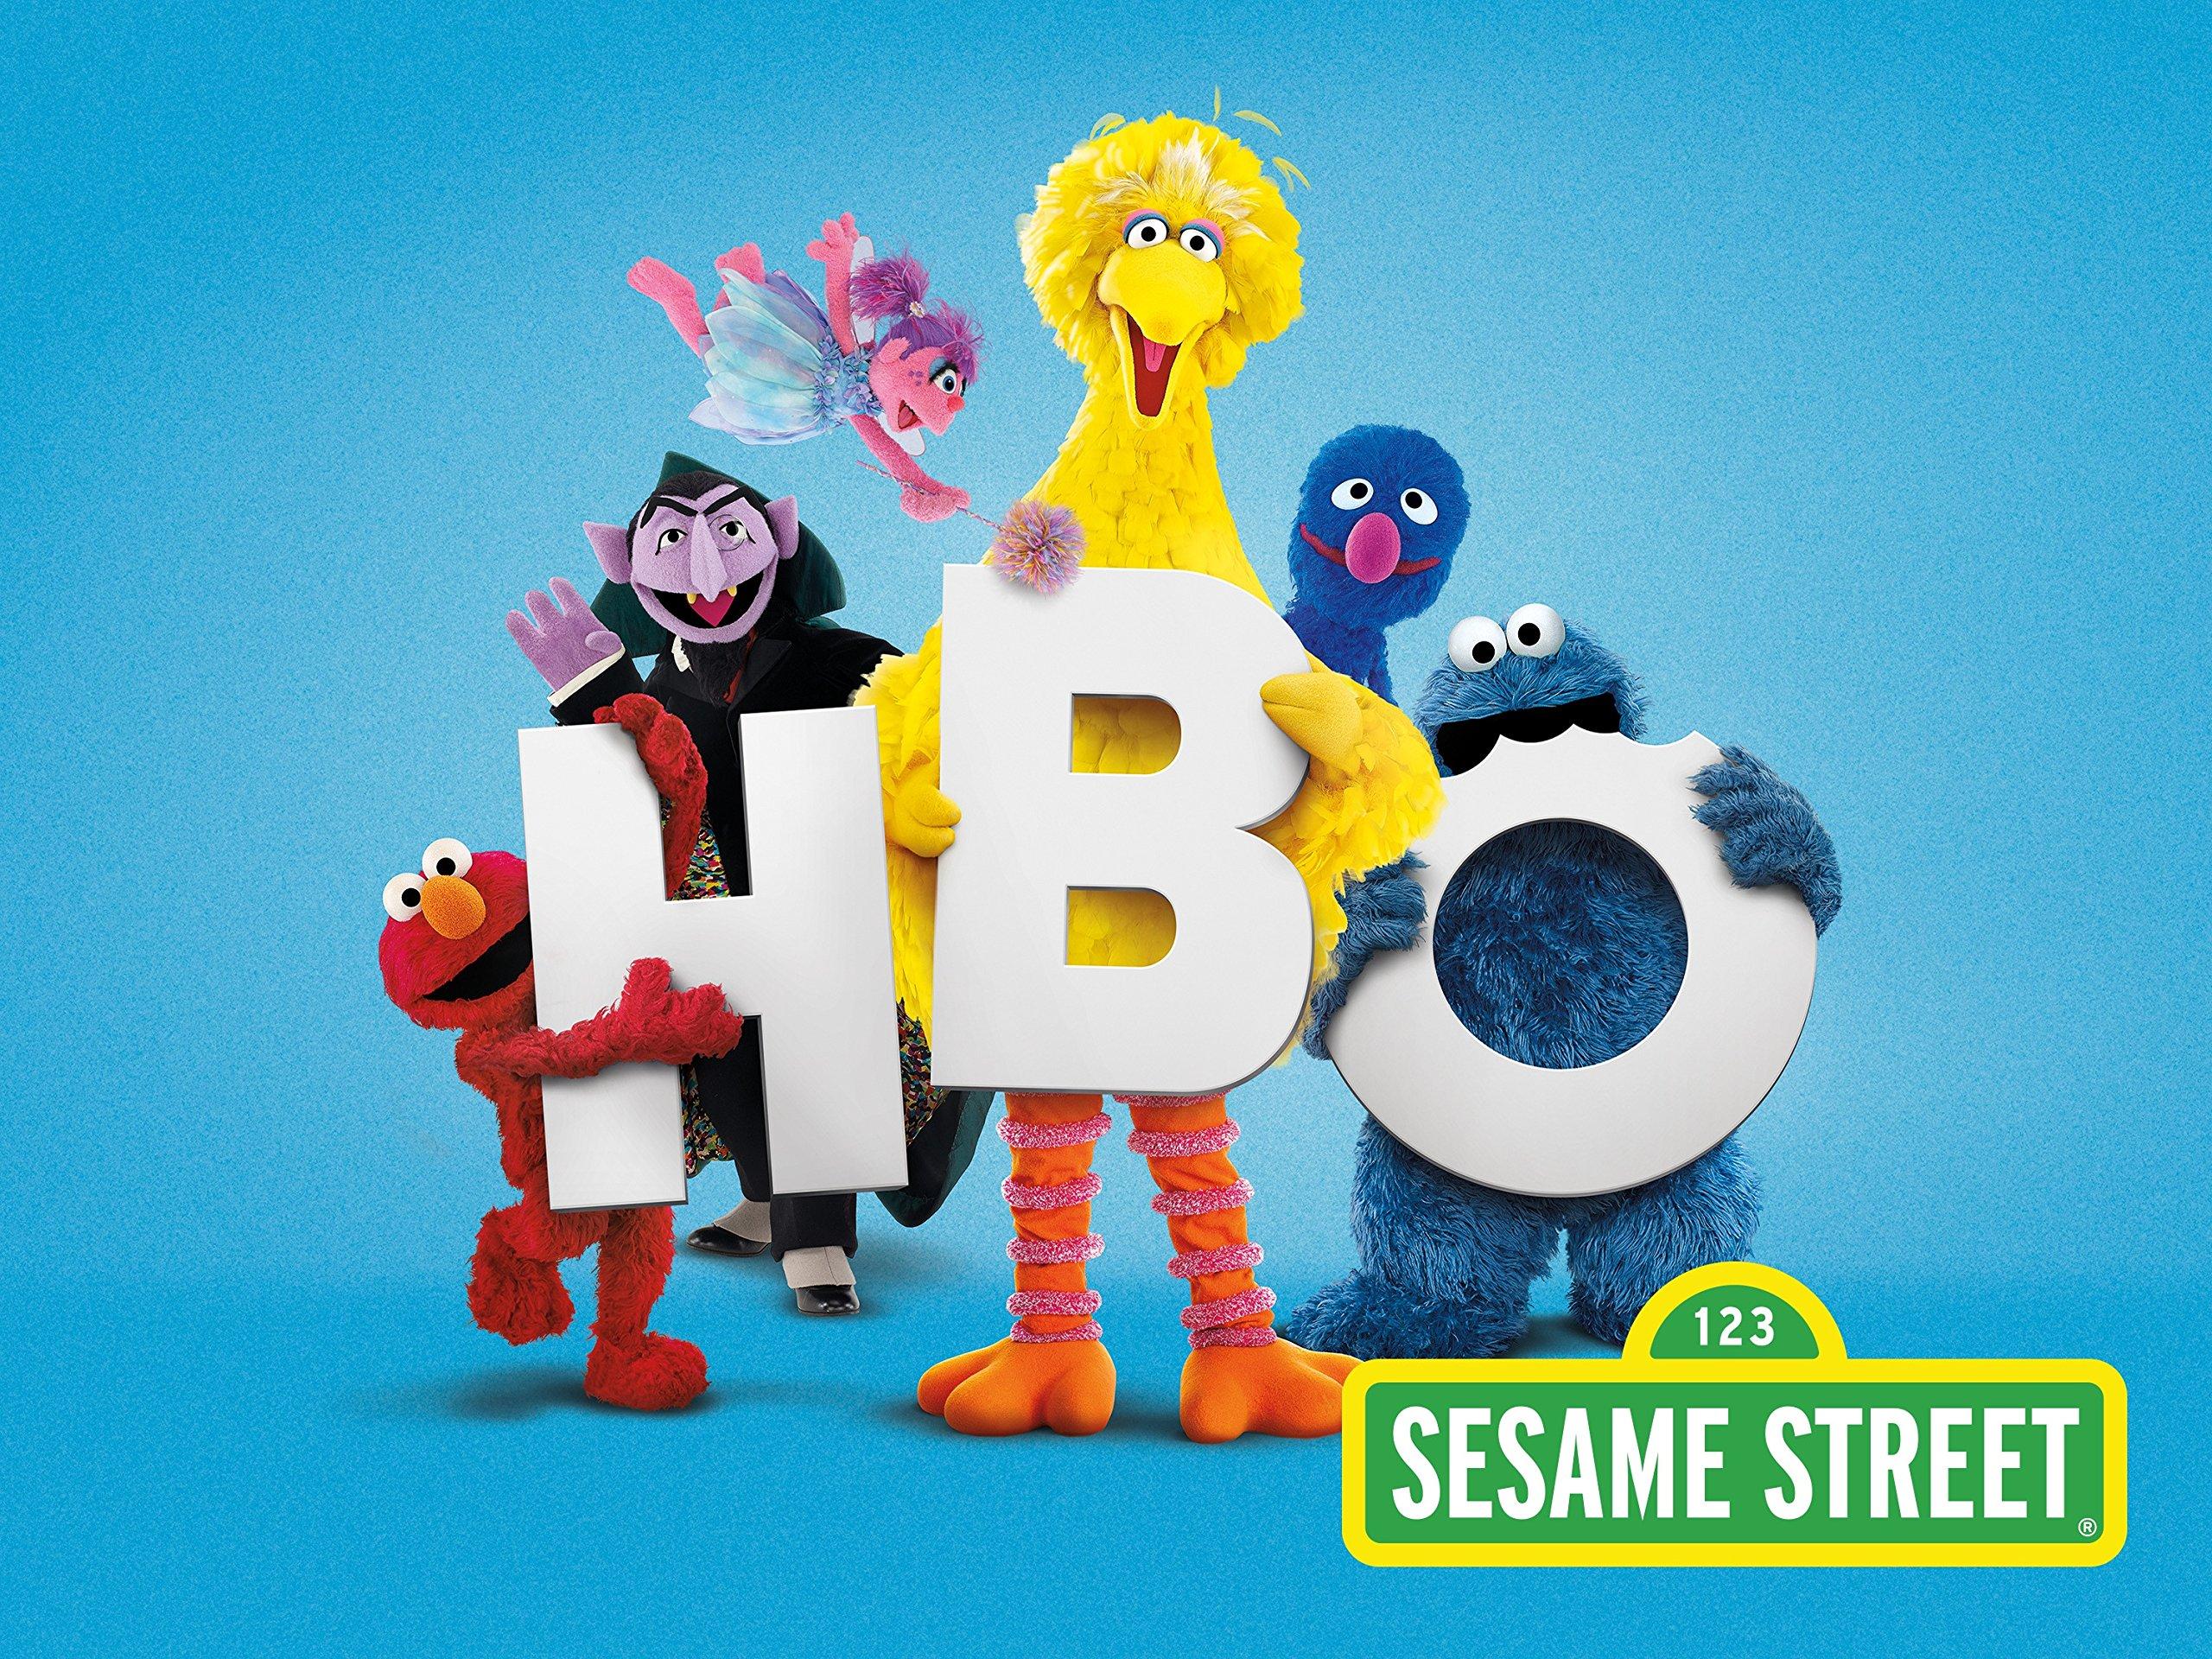 Amazon com: Watch Sesame Street - Season 46 | Prime Video